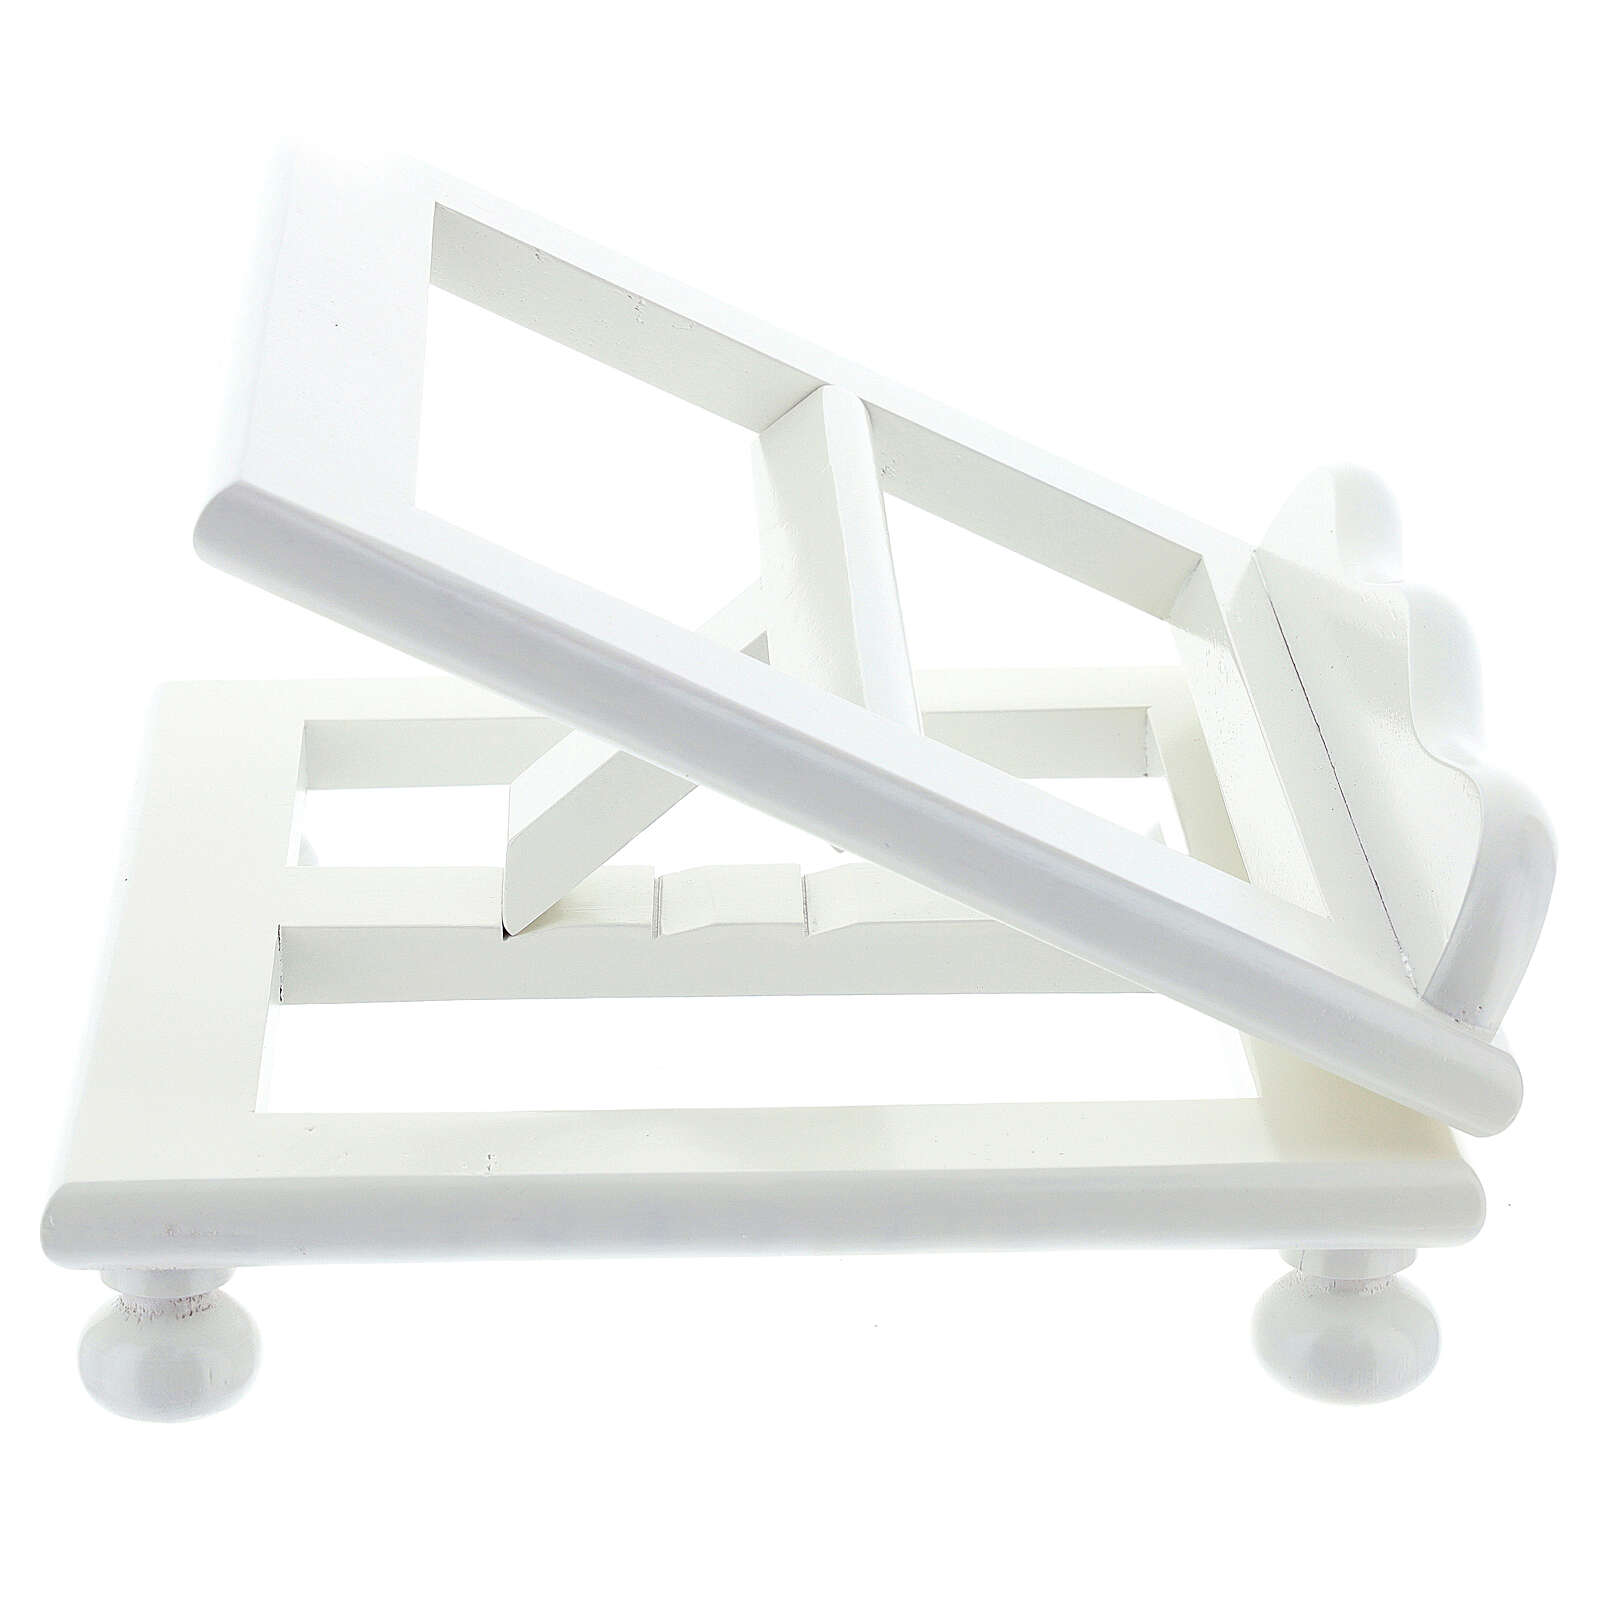 Leggio tavolo regolabile 30X35 cm bianco legno 4